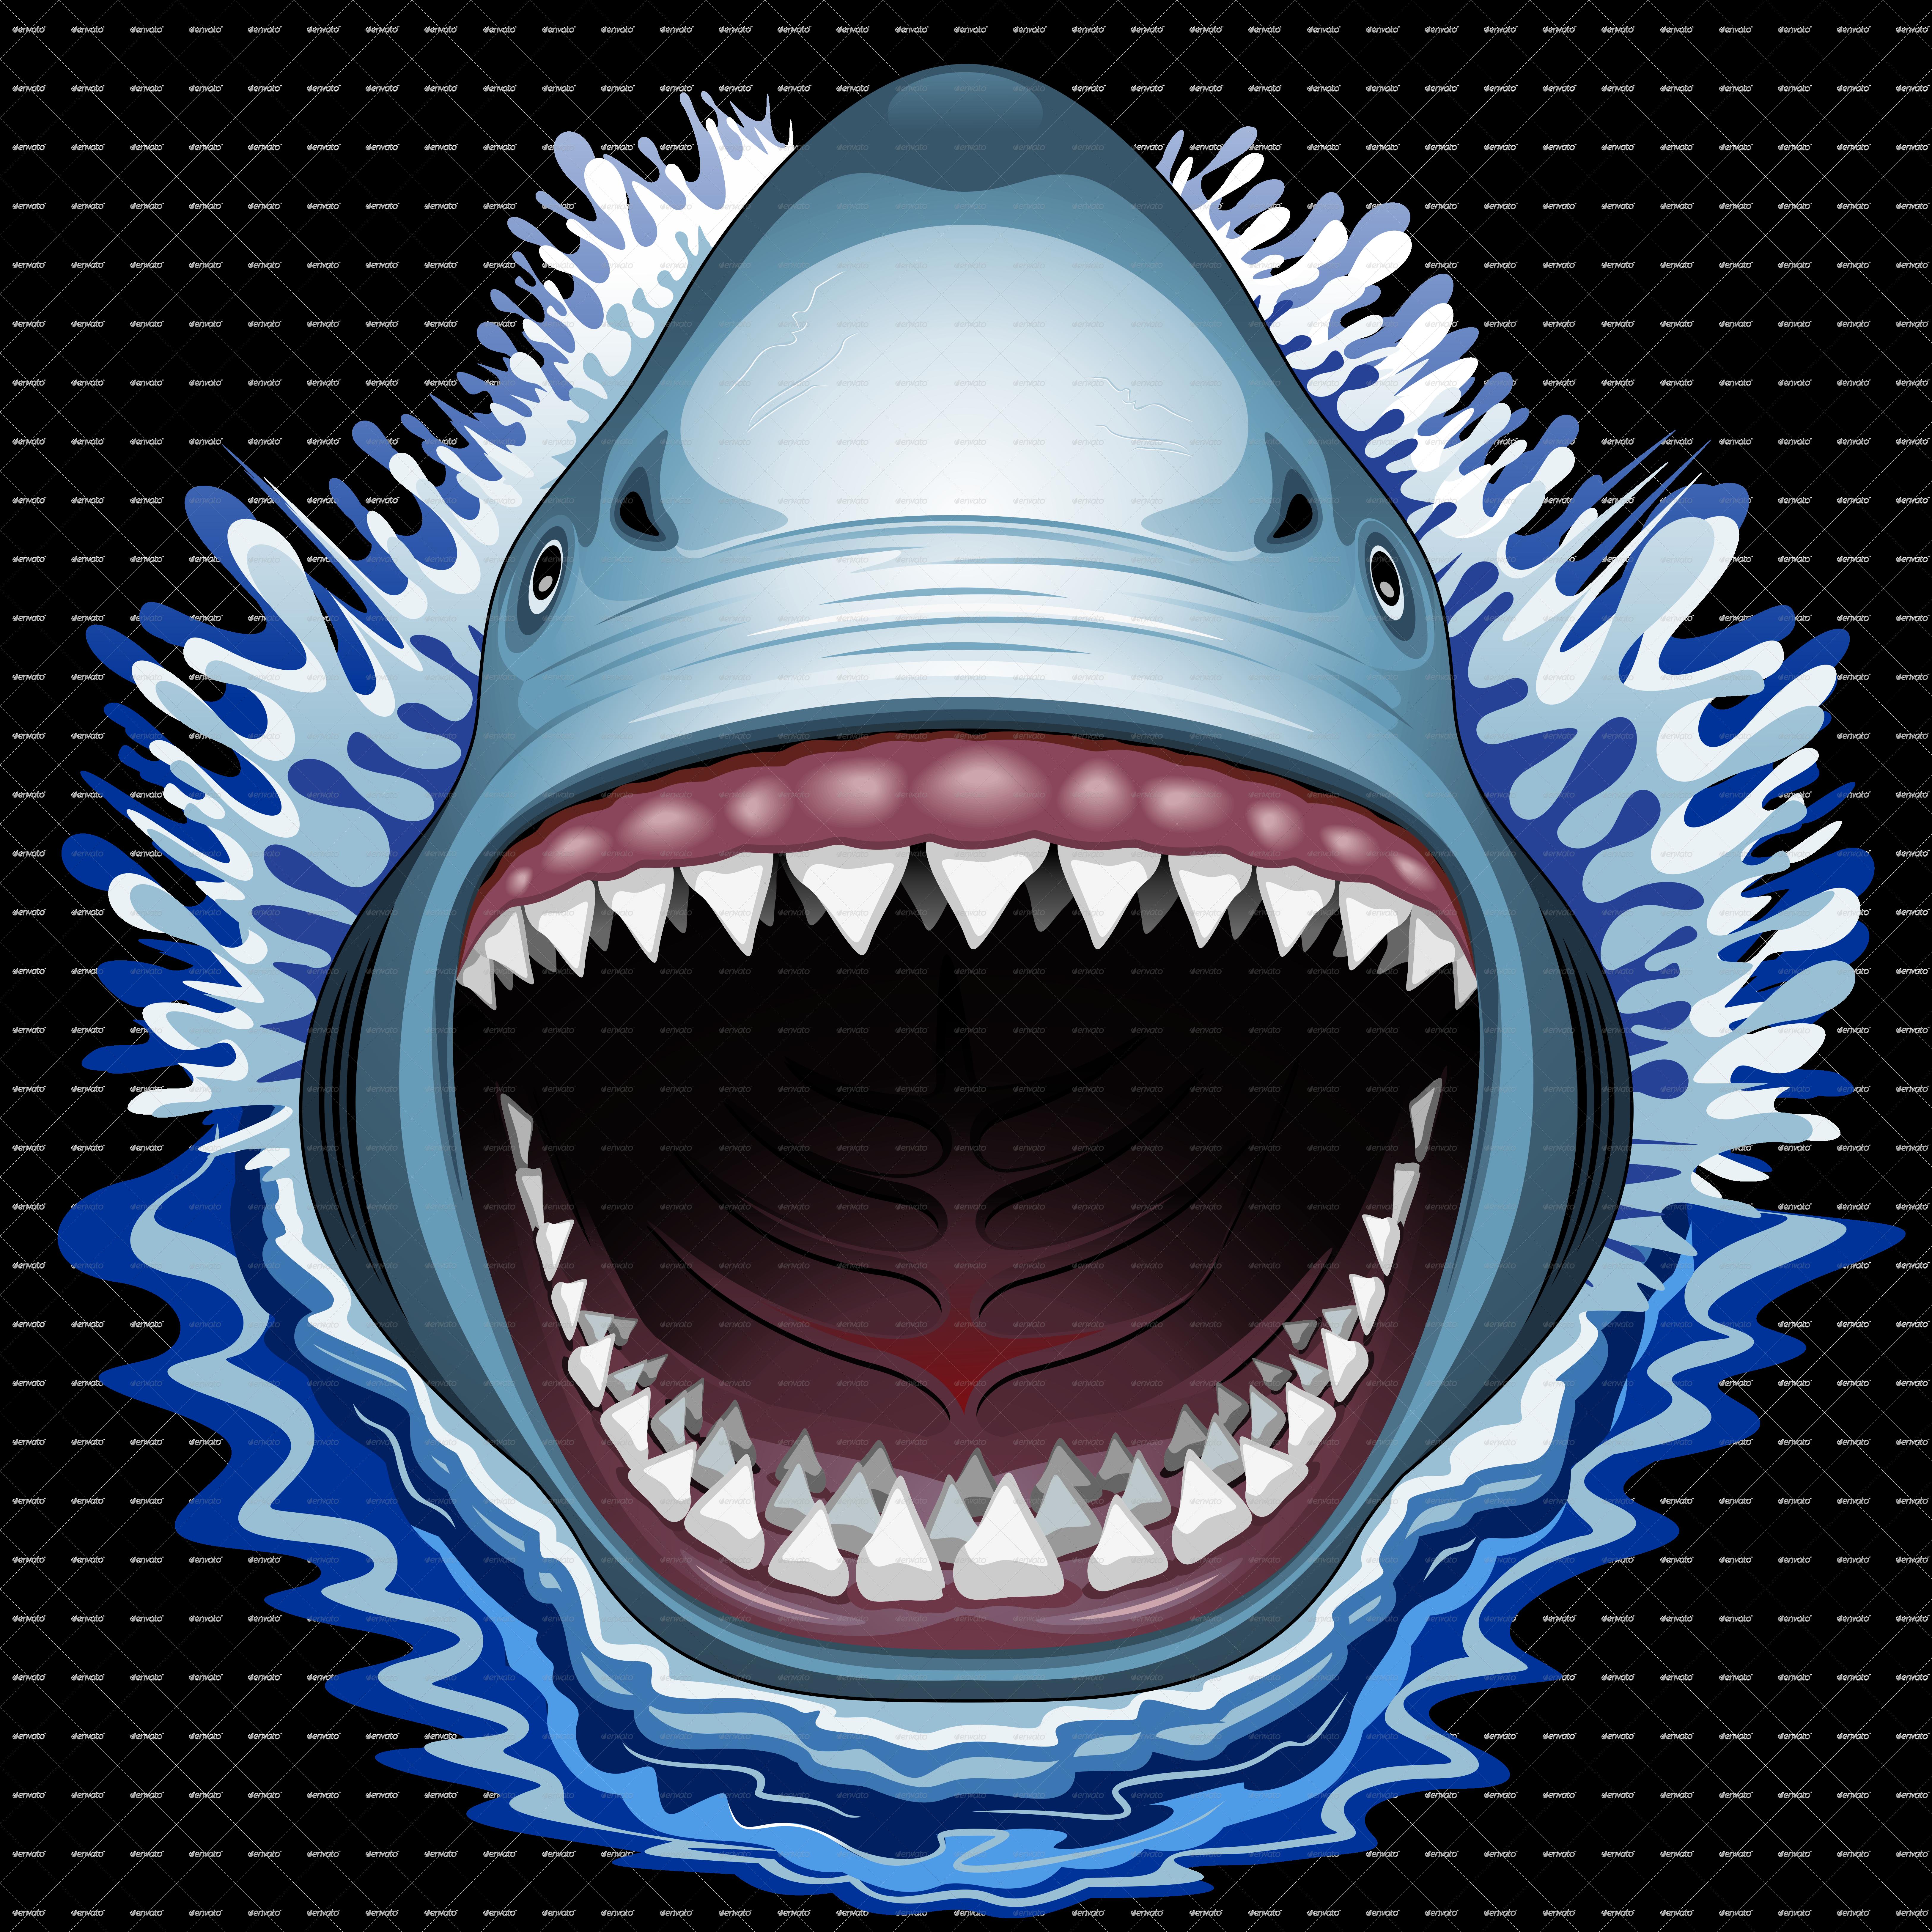 6500x6500 Shark Jaws Png Transparent Shark Jaws.png Images. Pluspng